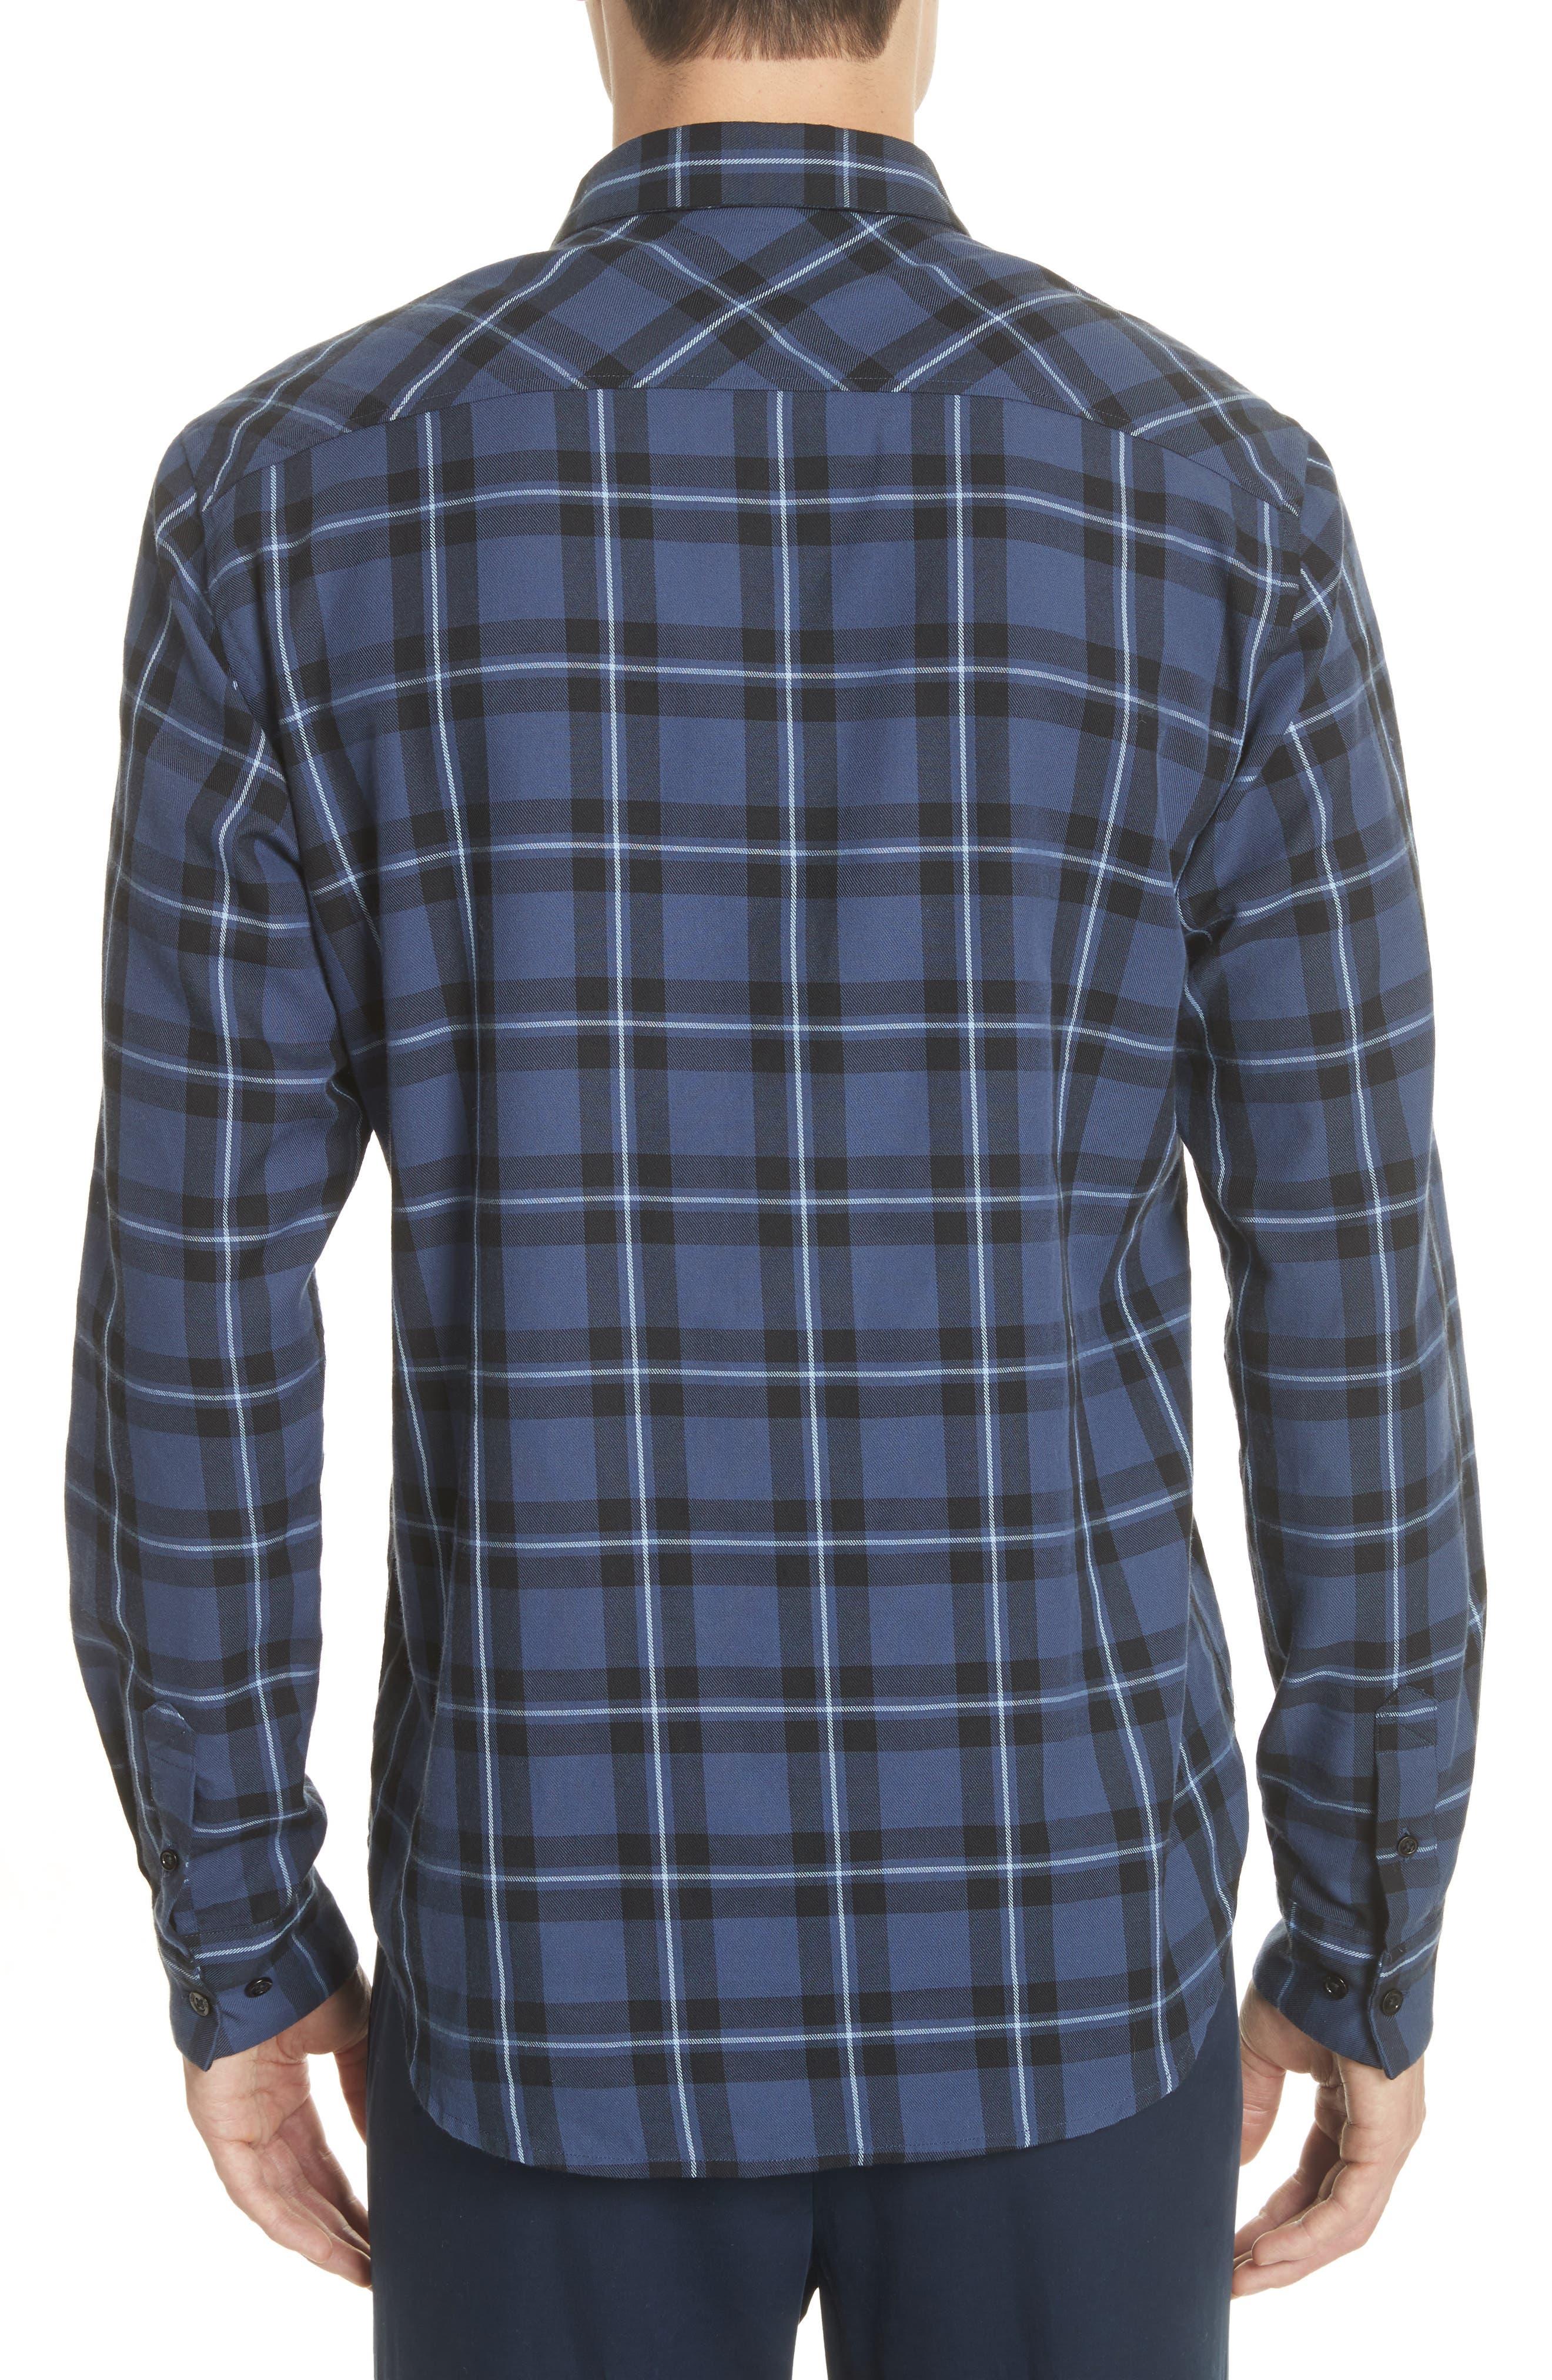 Hans Check Woven Shirt,                             Alternate thumbnail 2, color,                             410